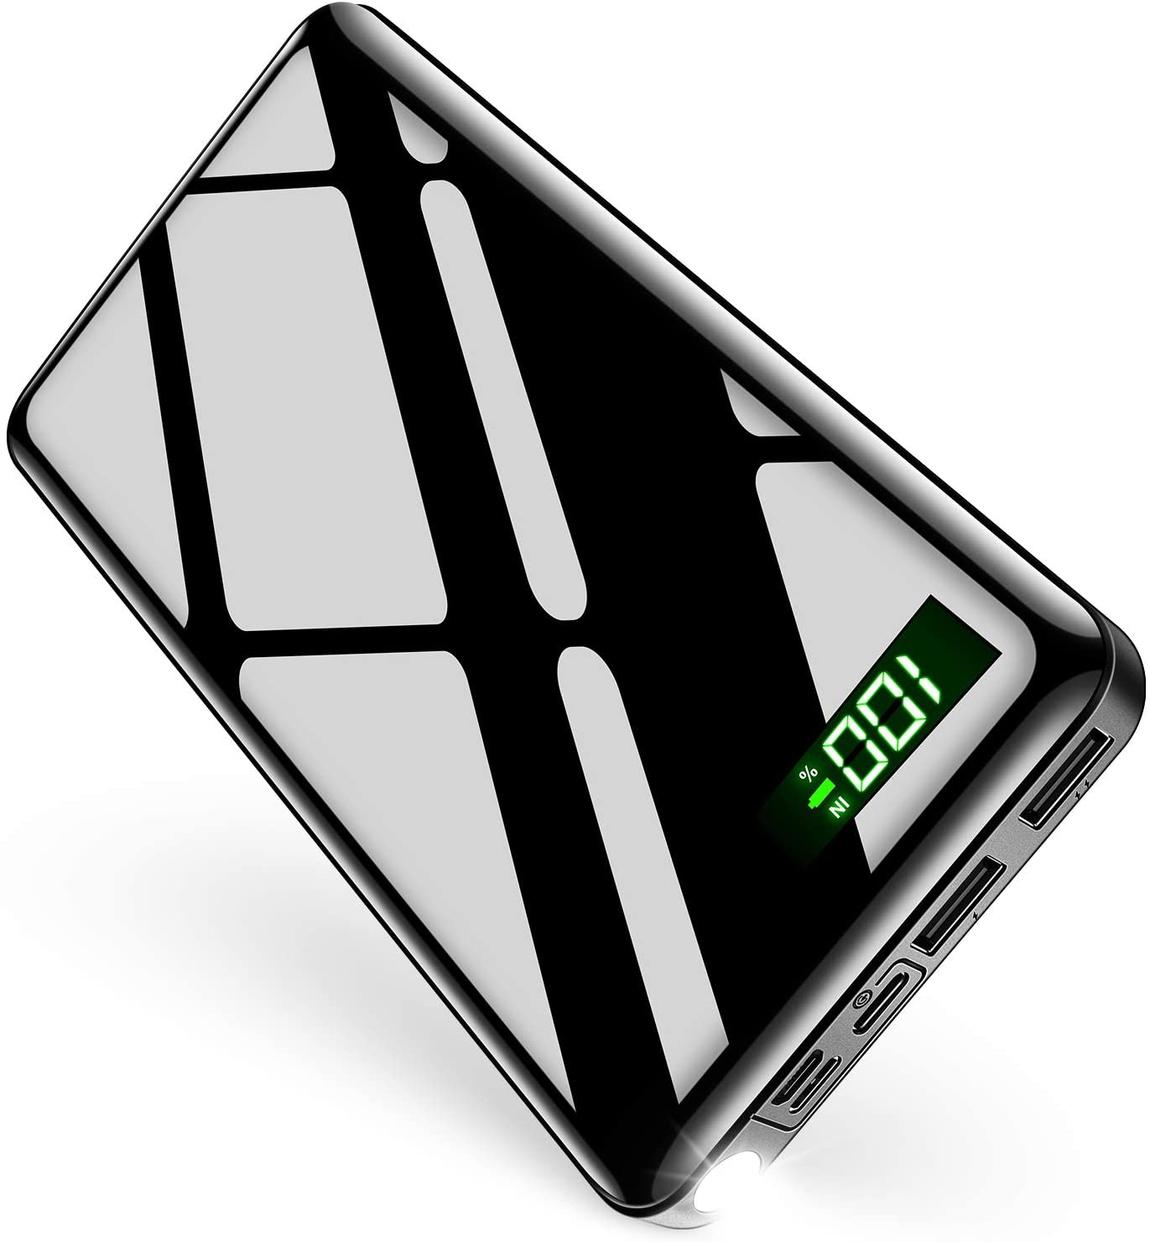 DeliToo 26800mAh超大容量モバイルバッテリー T-05の商品画像